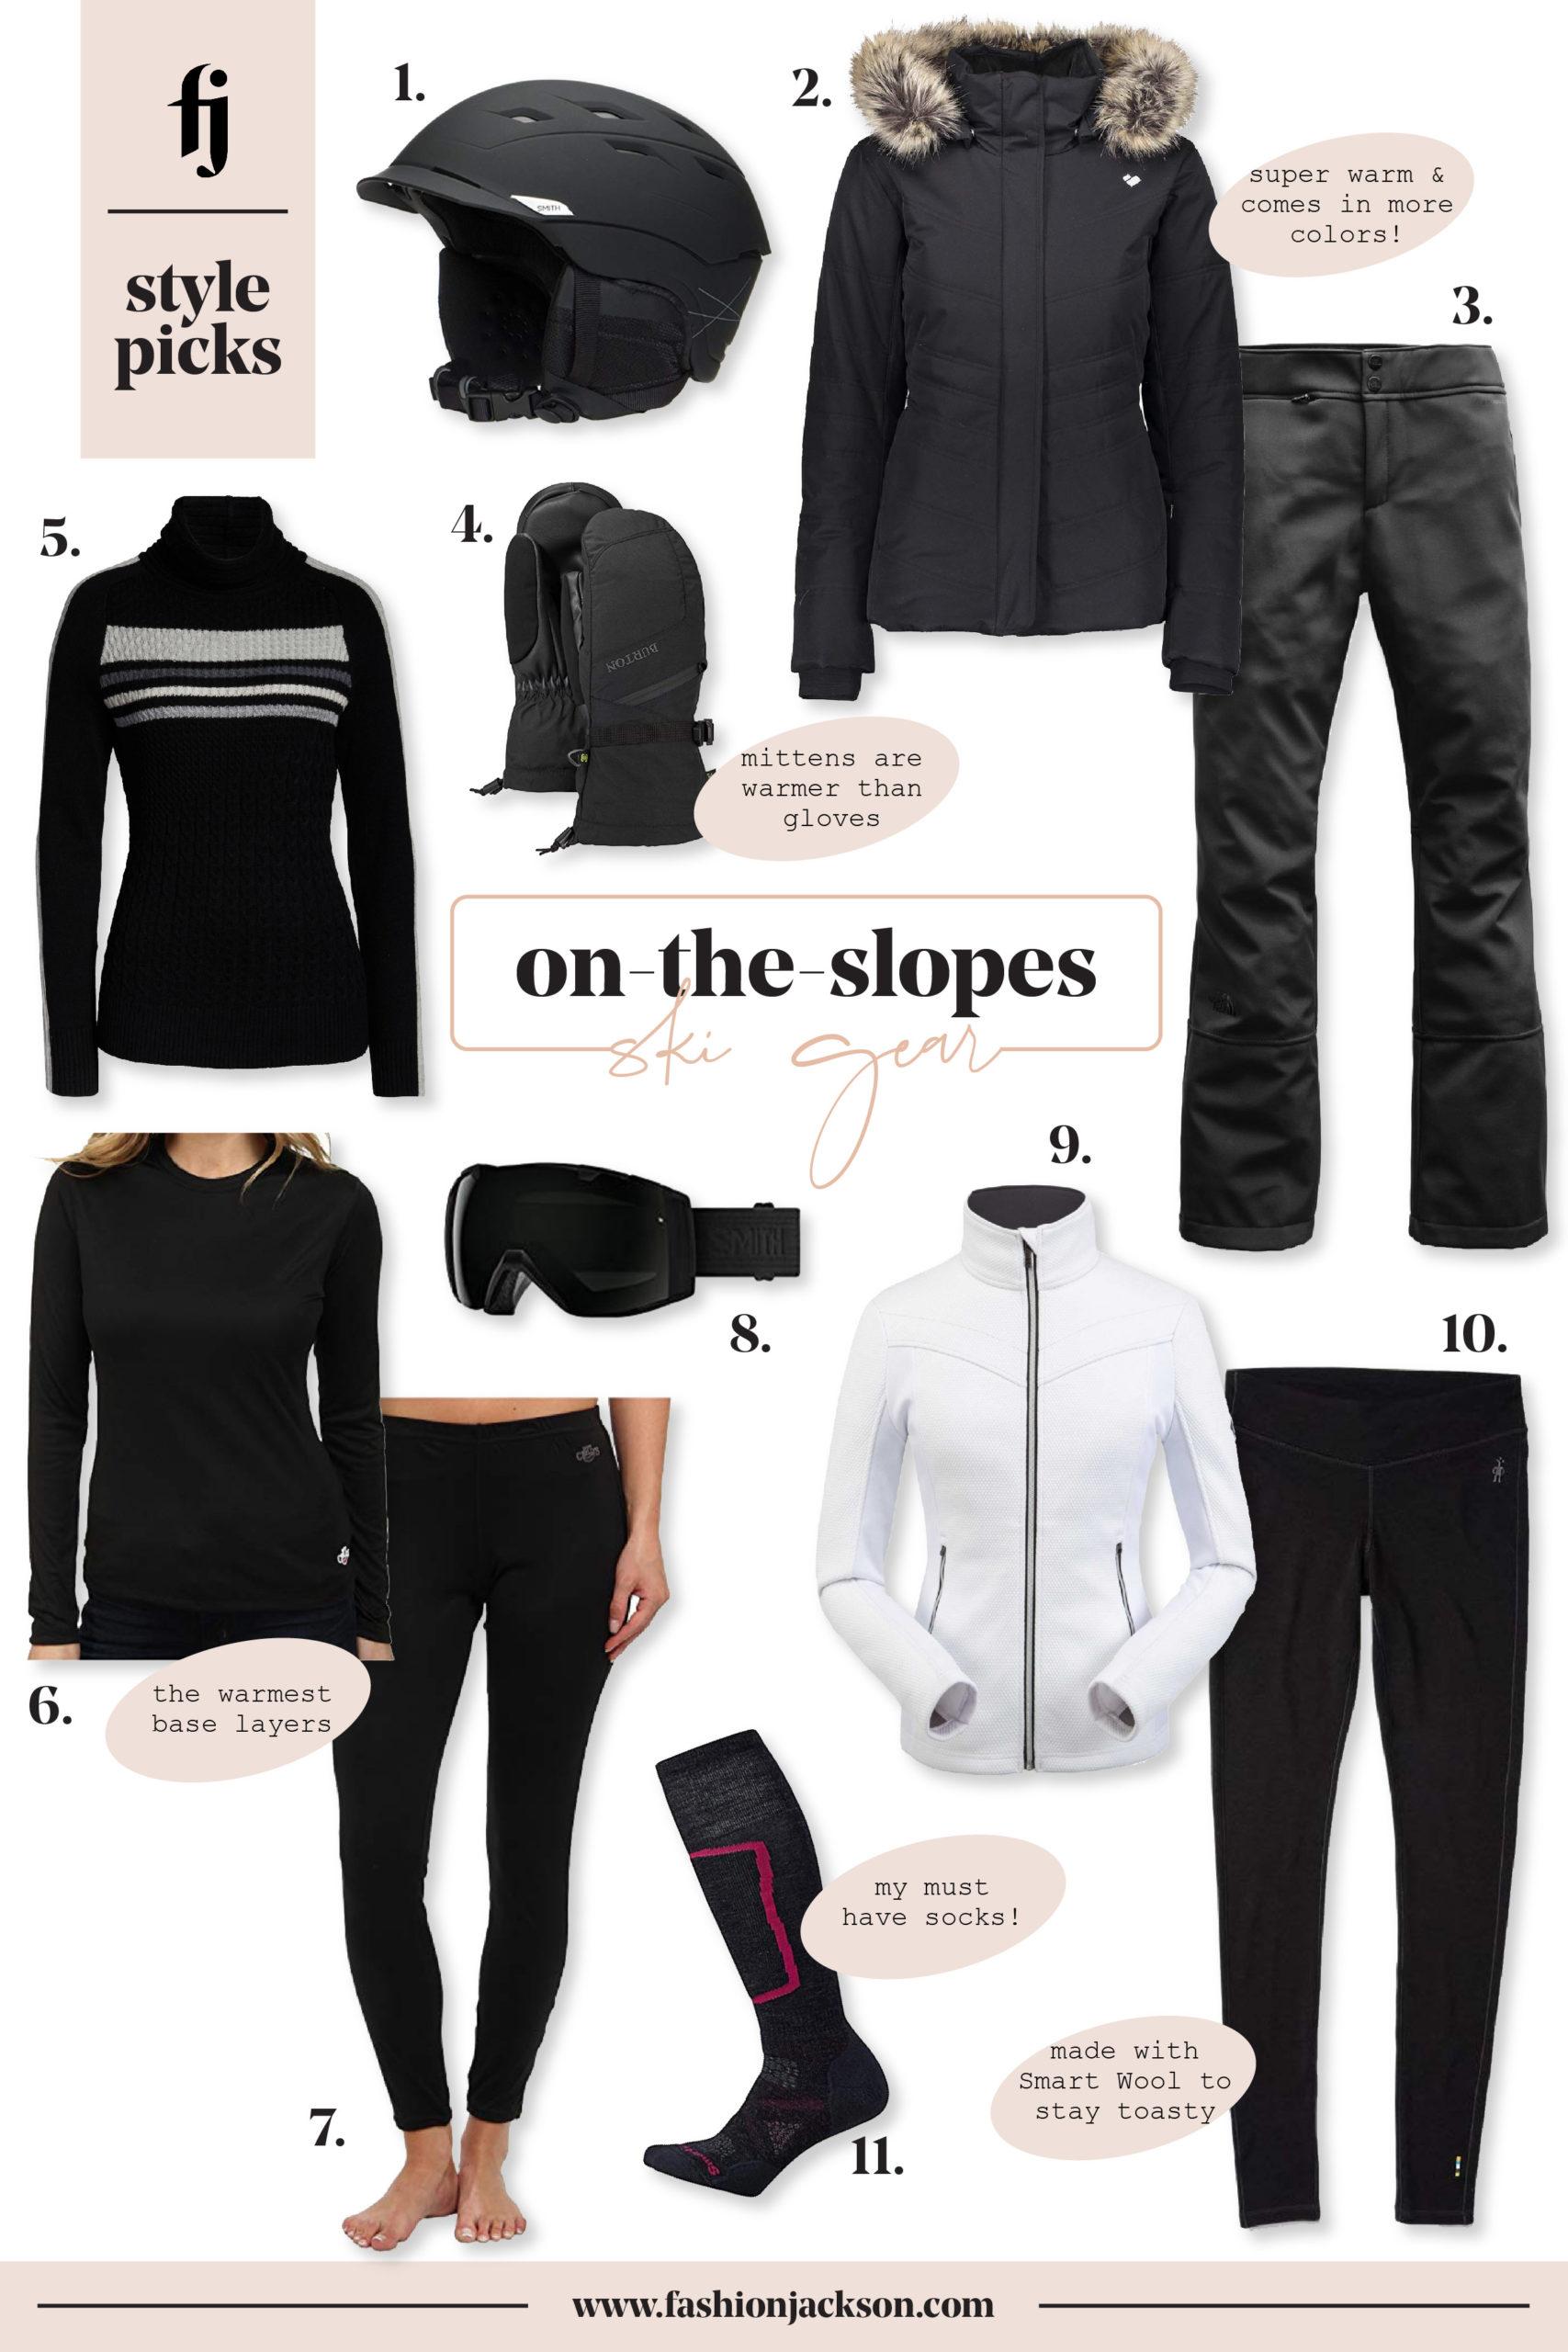 fashion jackson ski gear collage